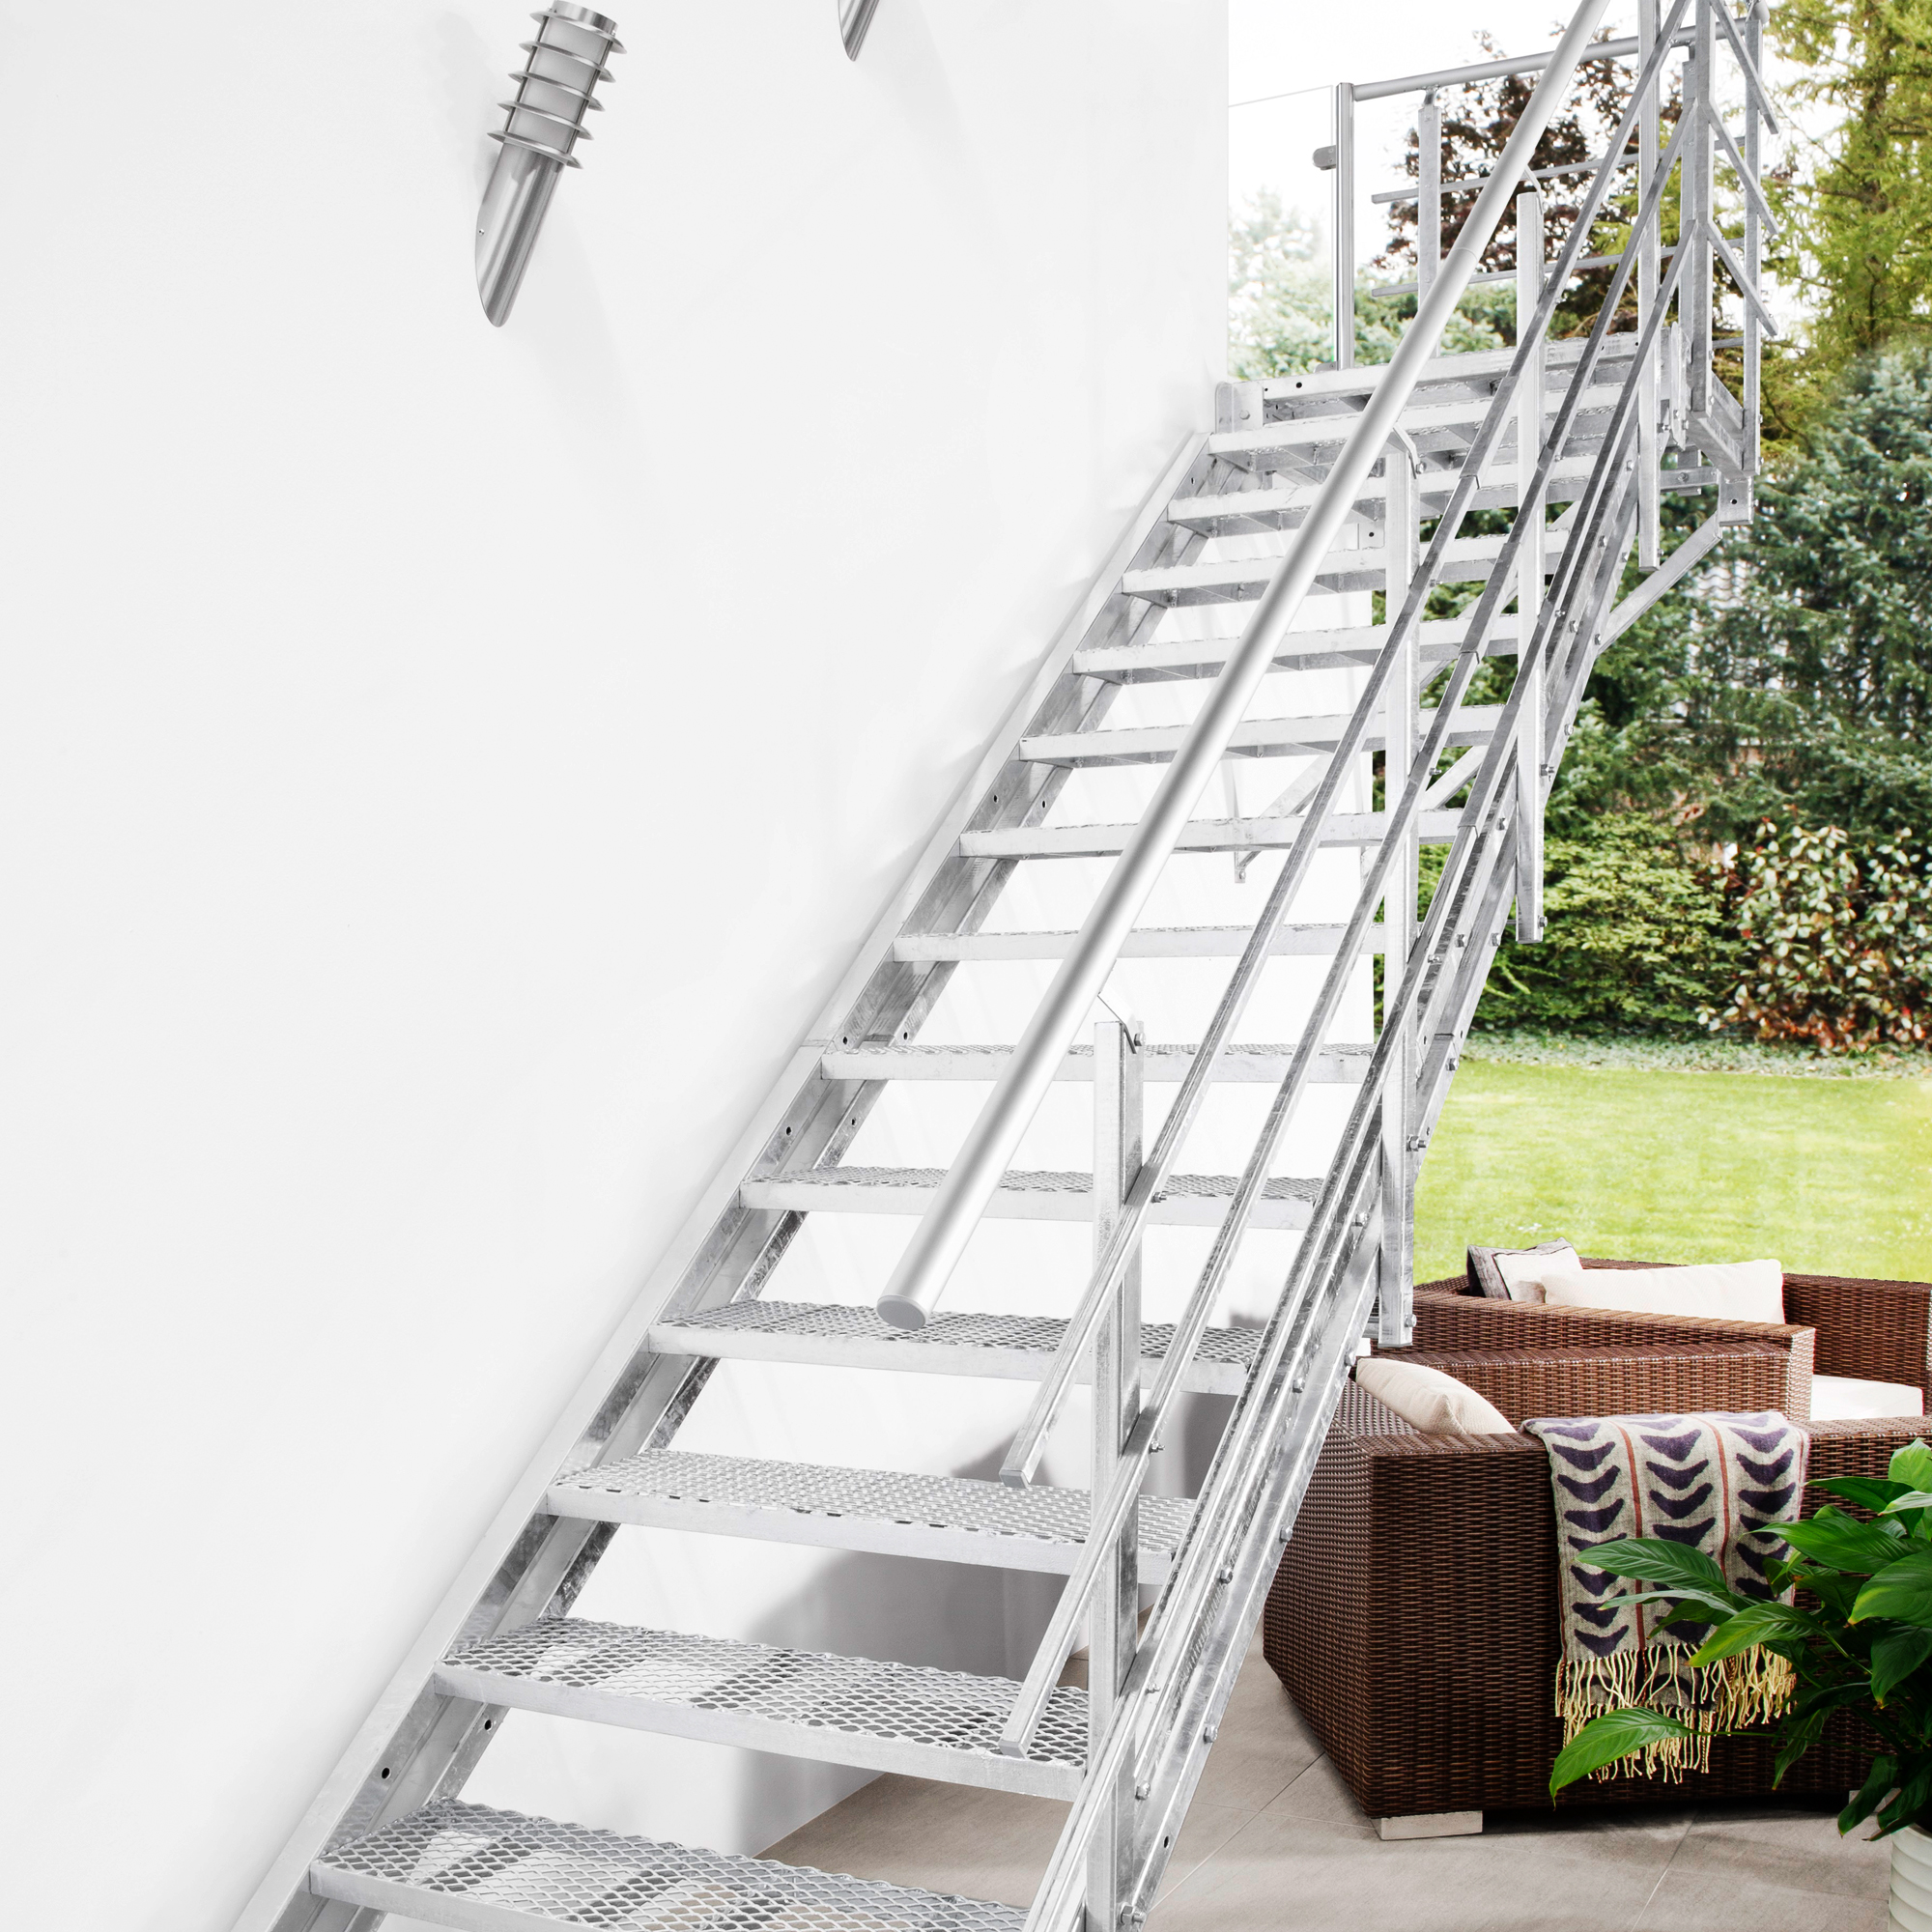 au entreppe mit podest zum top preis kaufen treppenshop. Black Bedroom Furniture Sets. Home Design Ideas